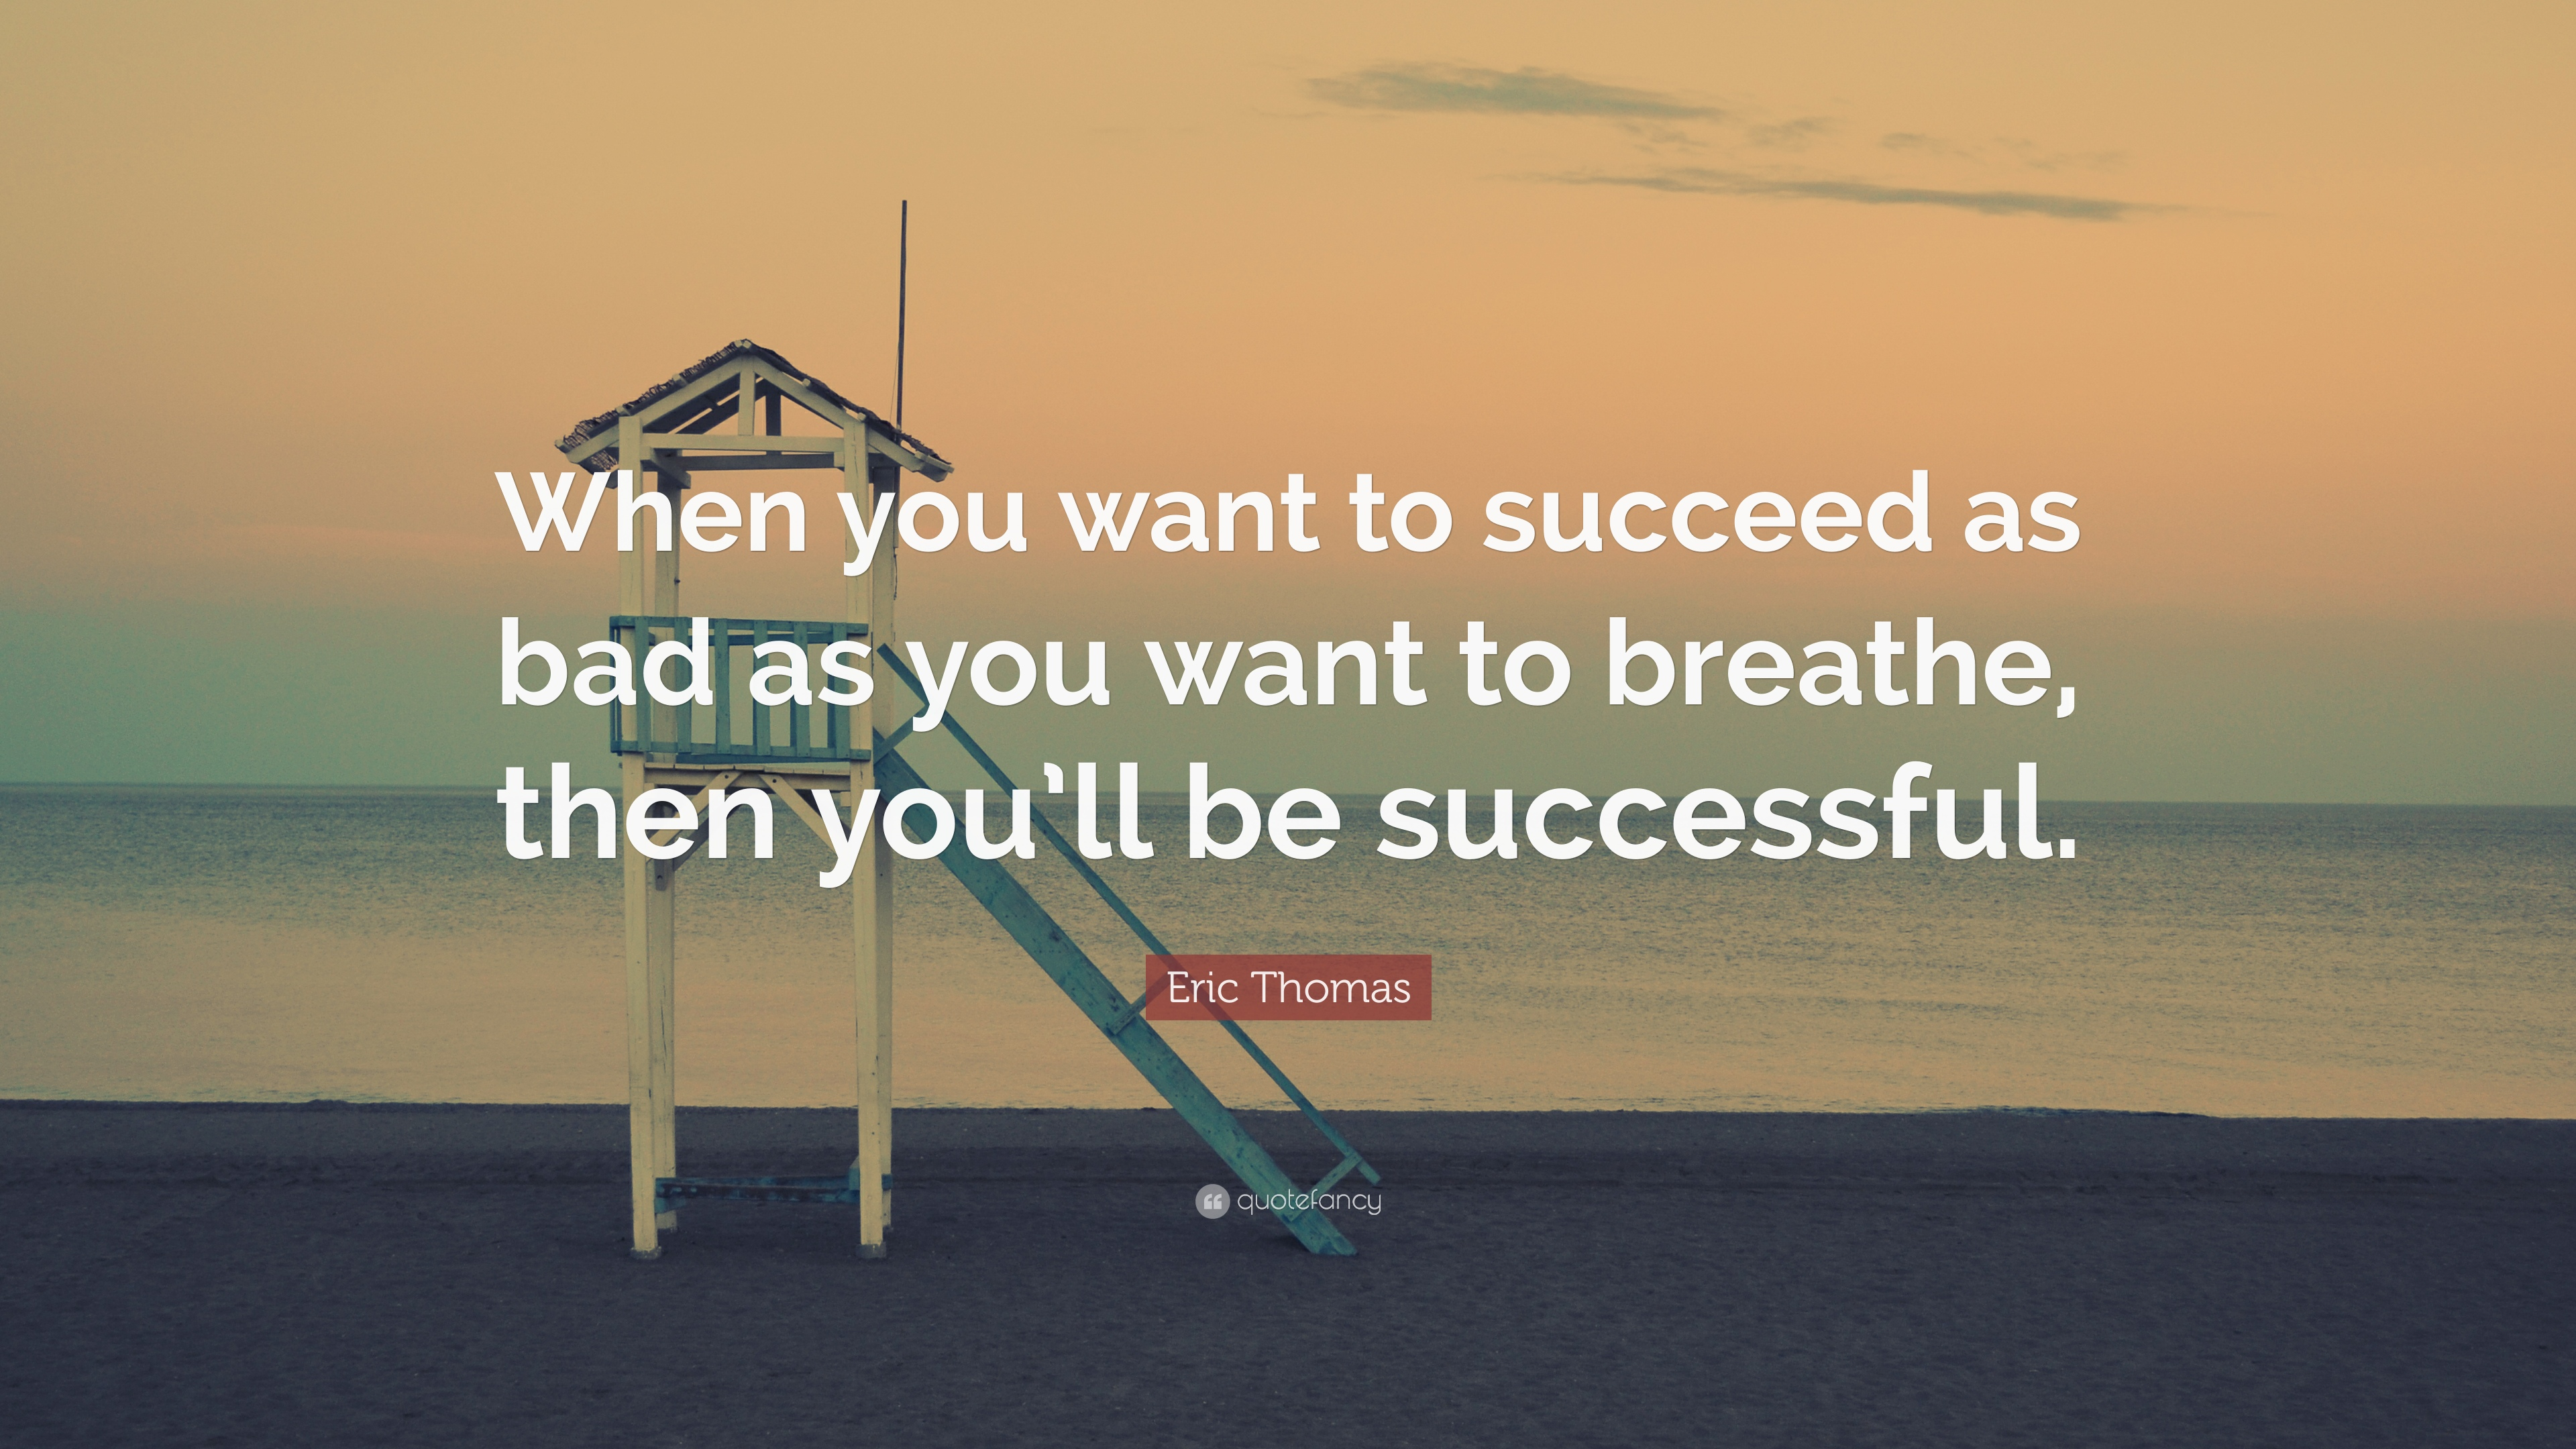 Eric Thomas Motivational Quotes Facebook thumbnail